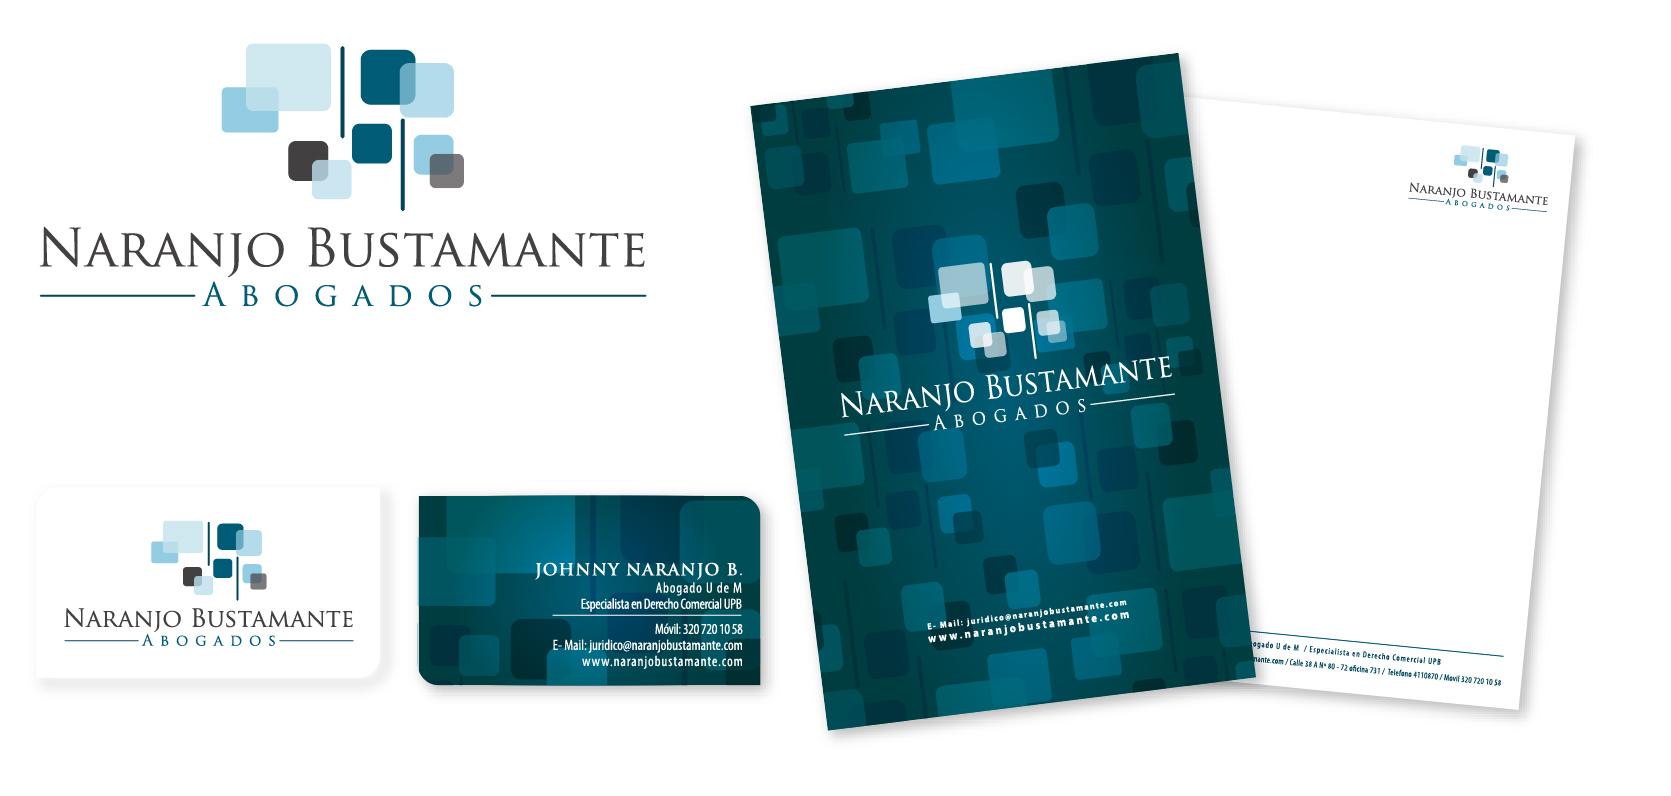 Branding Naranjo Bustamante Lawyers Branding